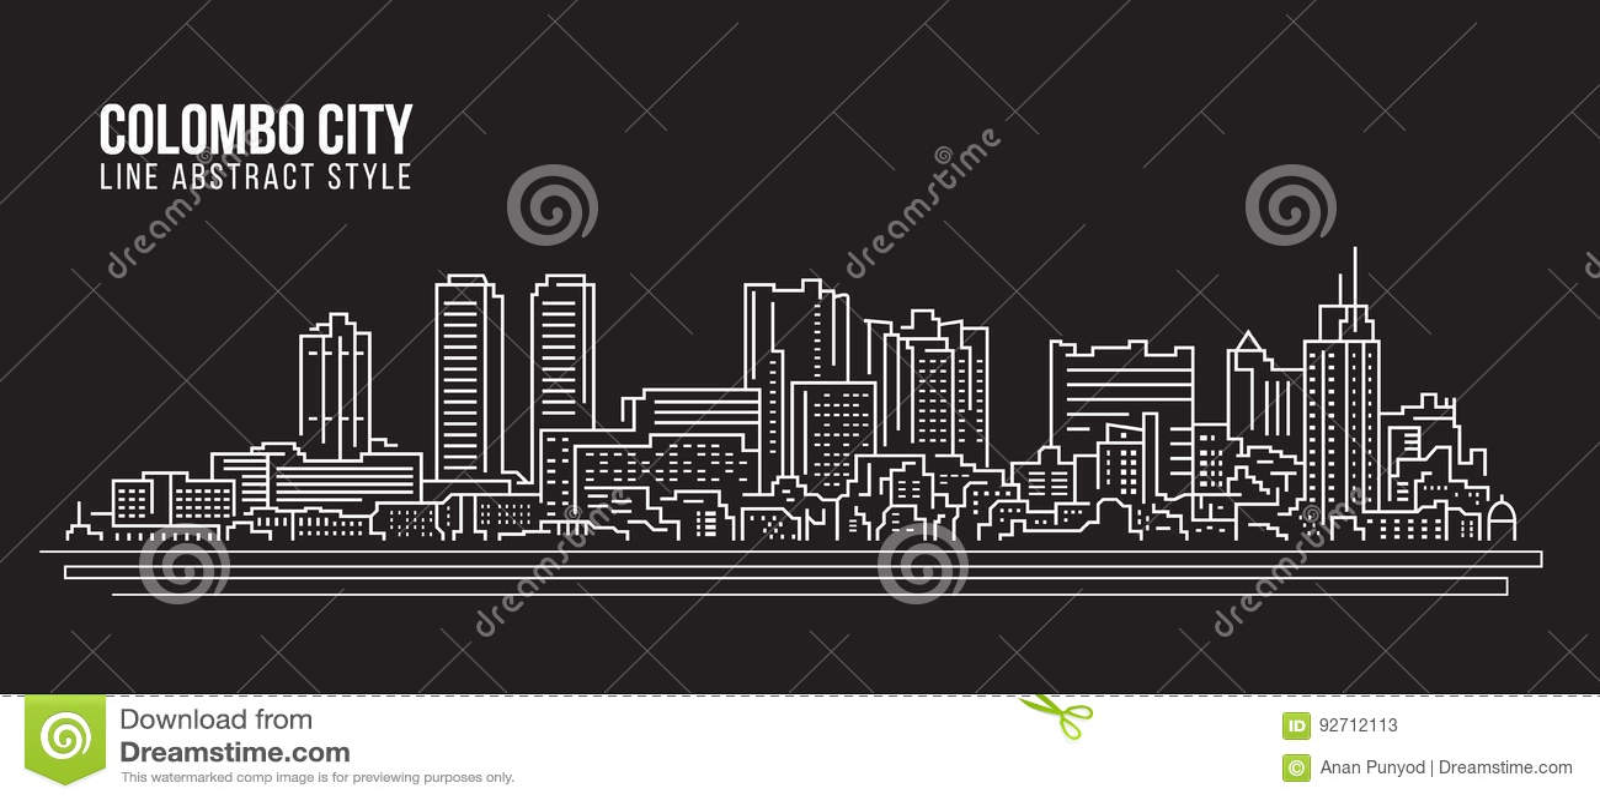 Line Art City : Cityscape building line art vector illustration design colombo